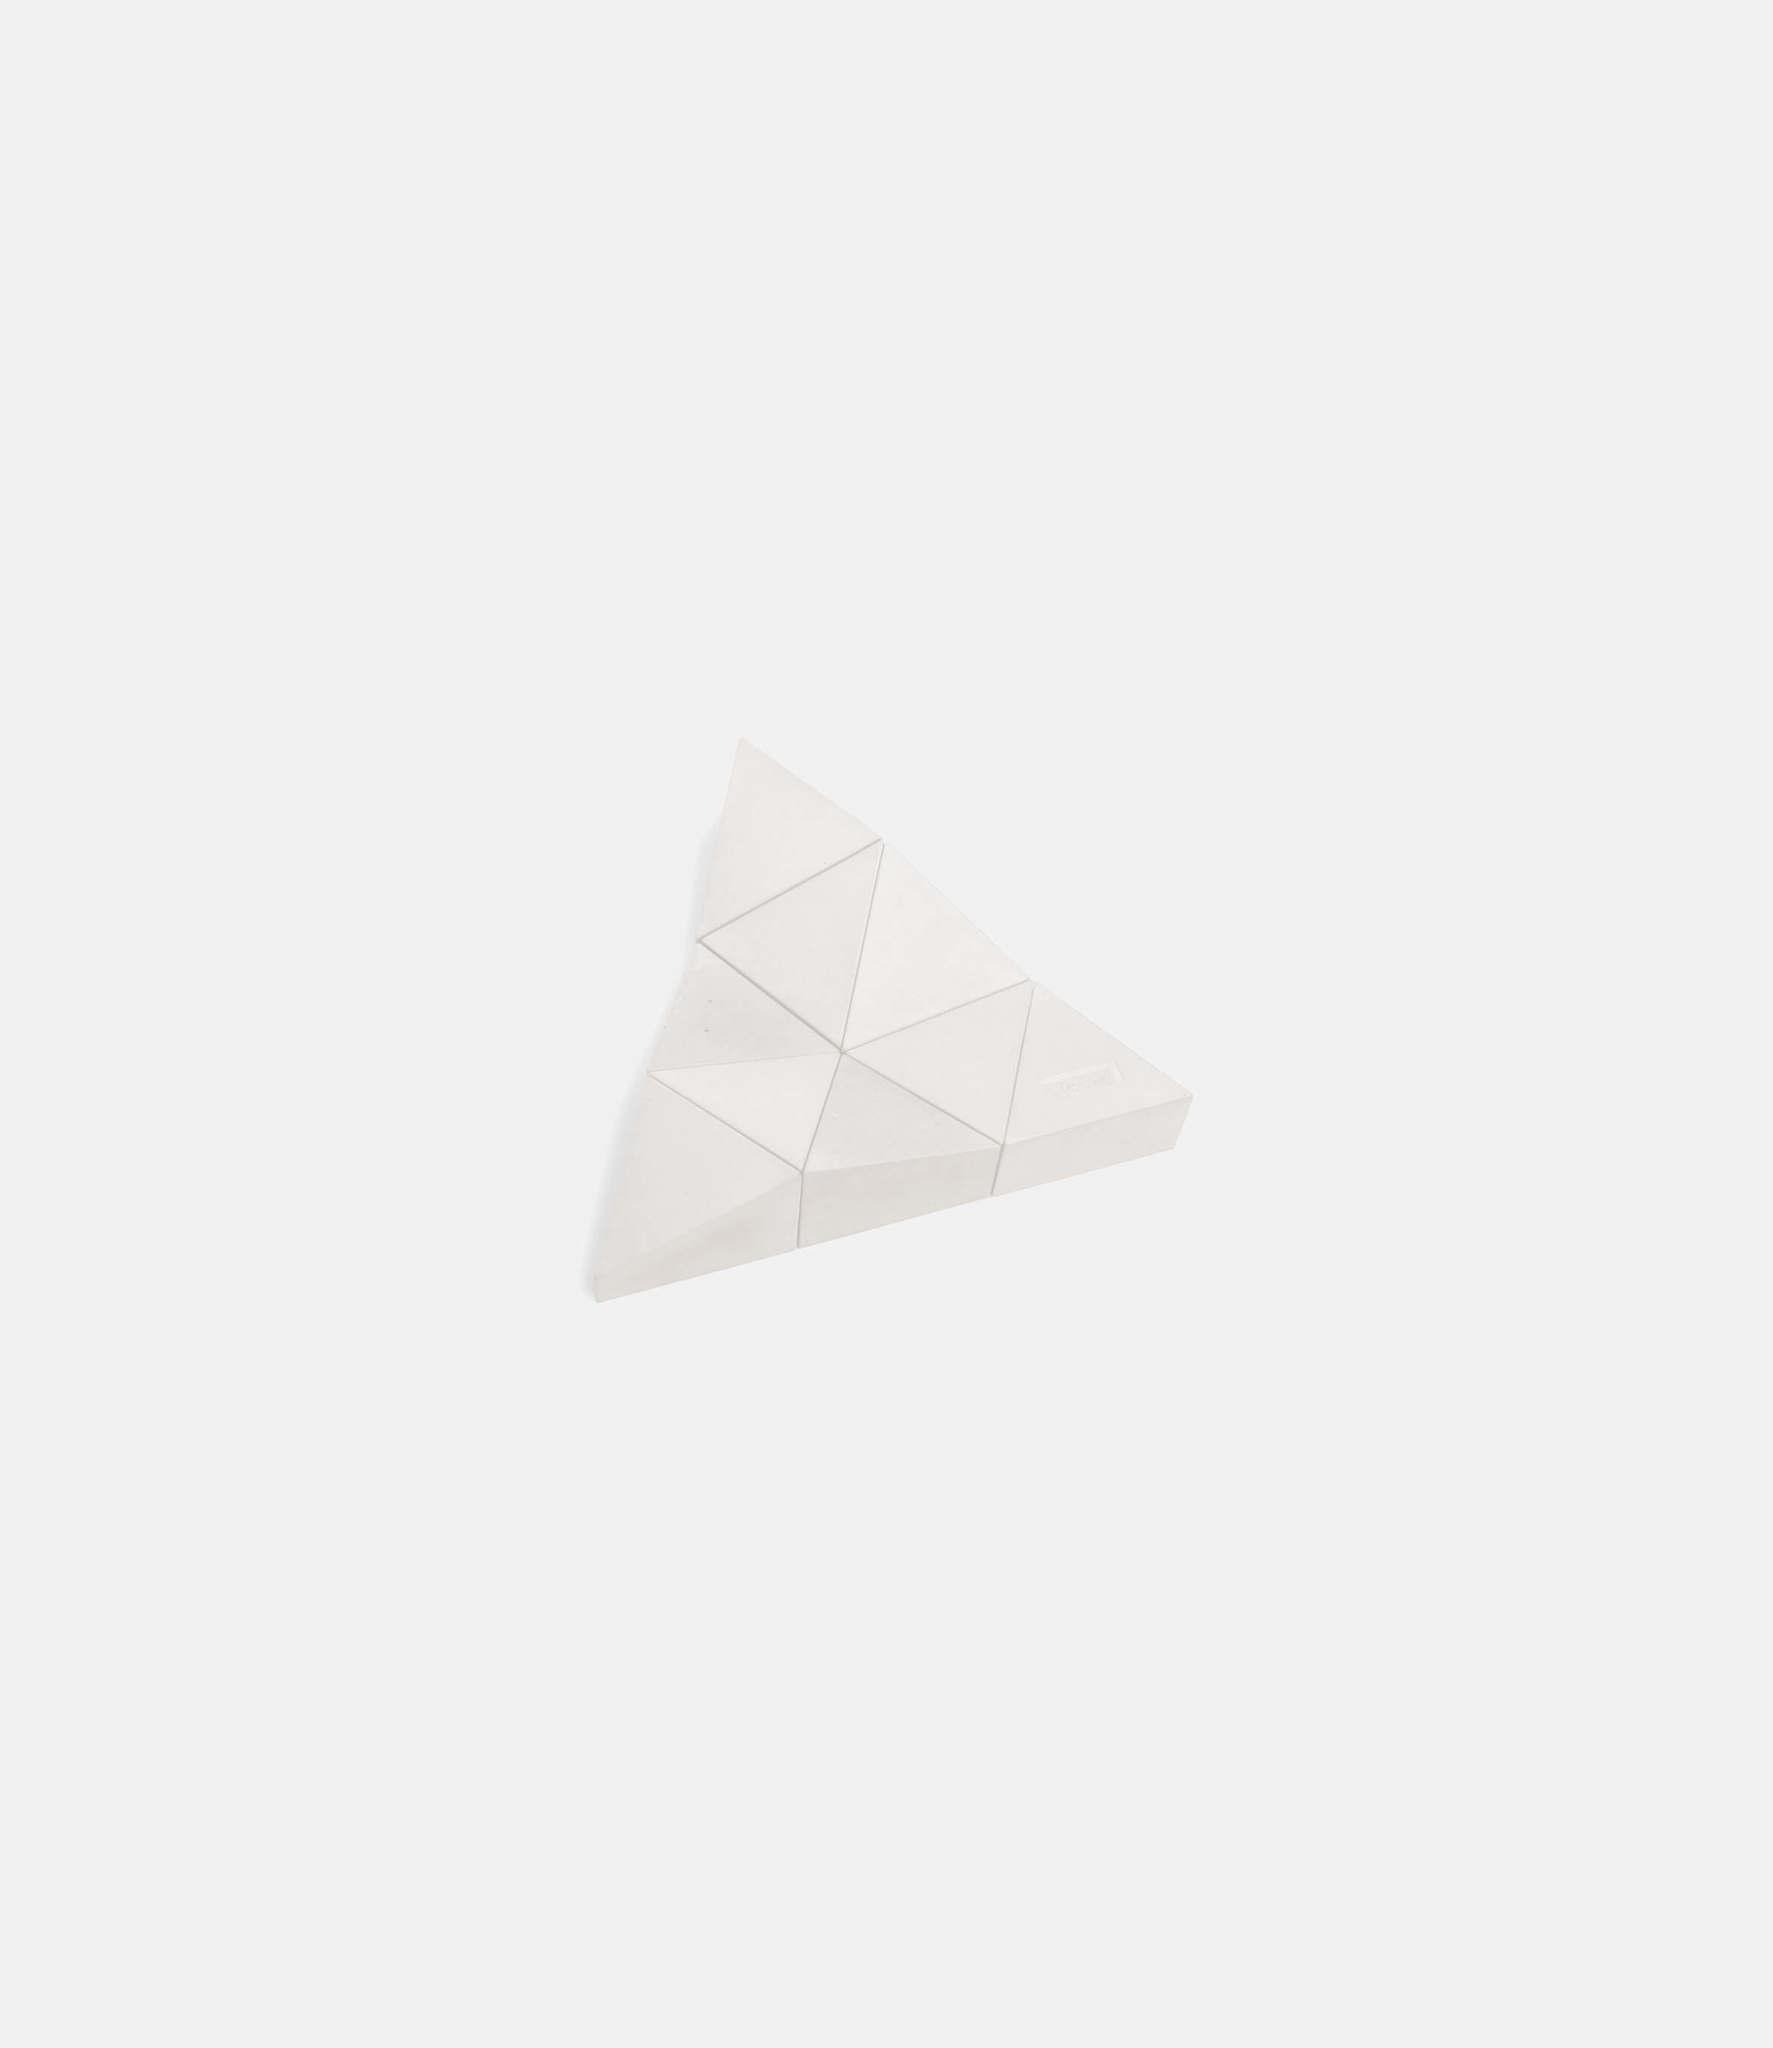 Logideez Logifaces Beginner Set Marble — пазл из бетона: белый мрамор